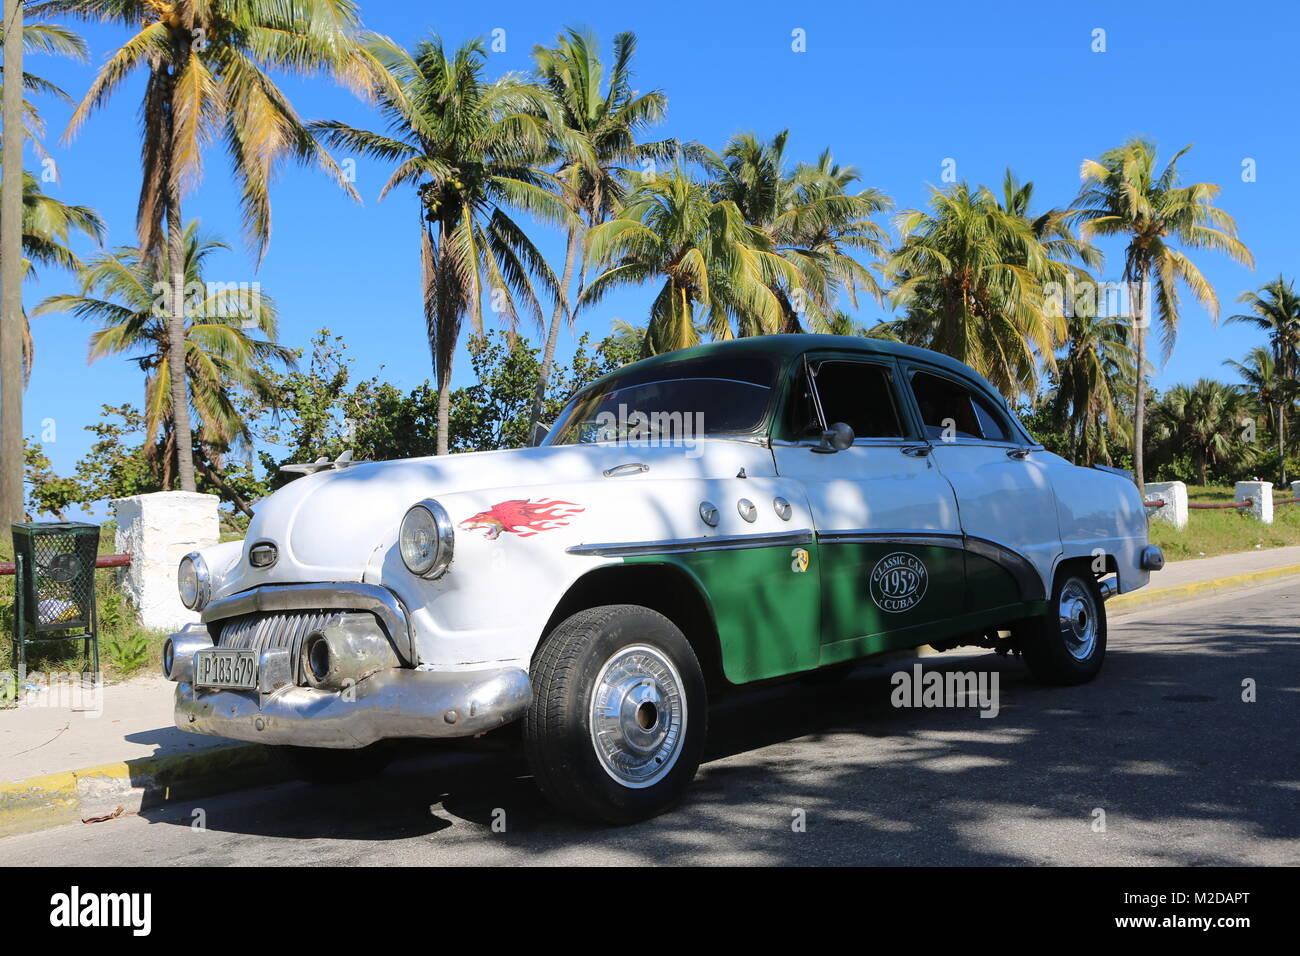 Cars in Street of La Habana - Cuba - Stock Image